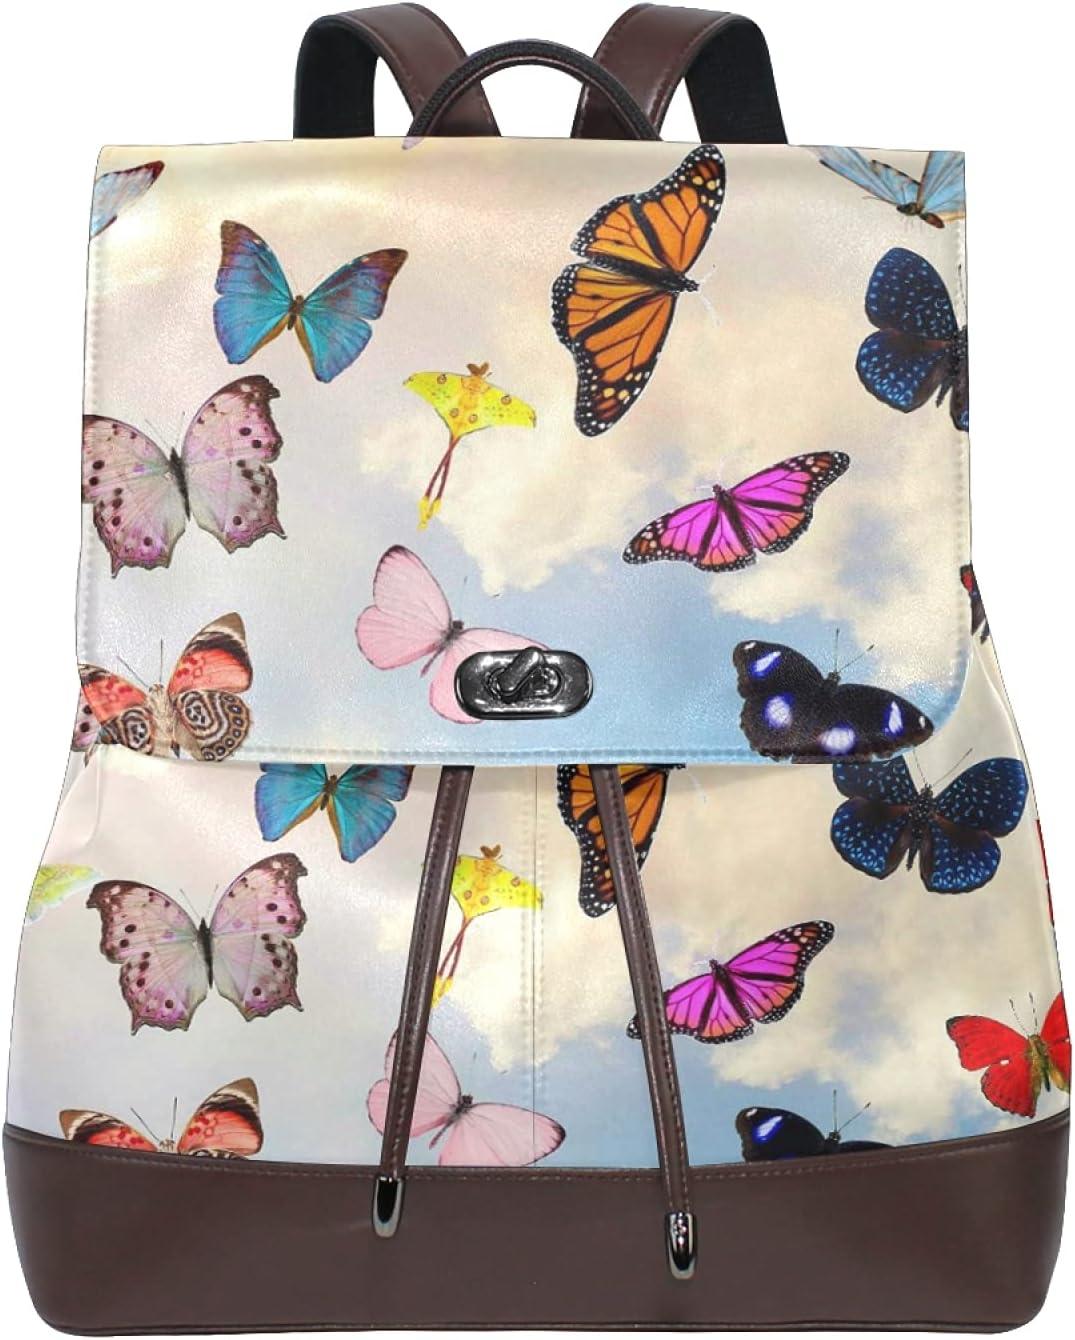 Women Leather Backpack Ladies Fashion Shoulder Bag Large Travel Bag Butterfly Sky Collage